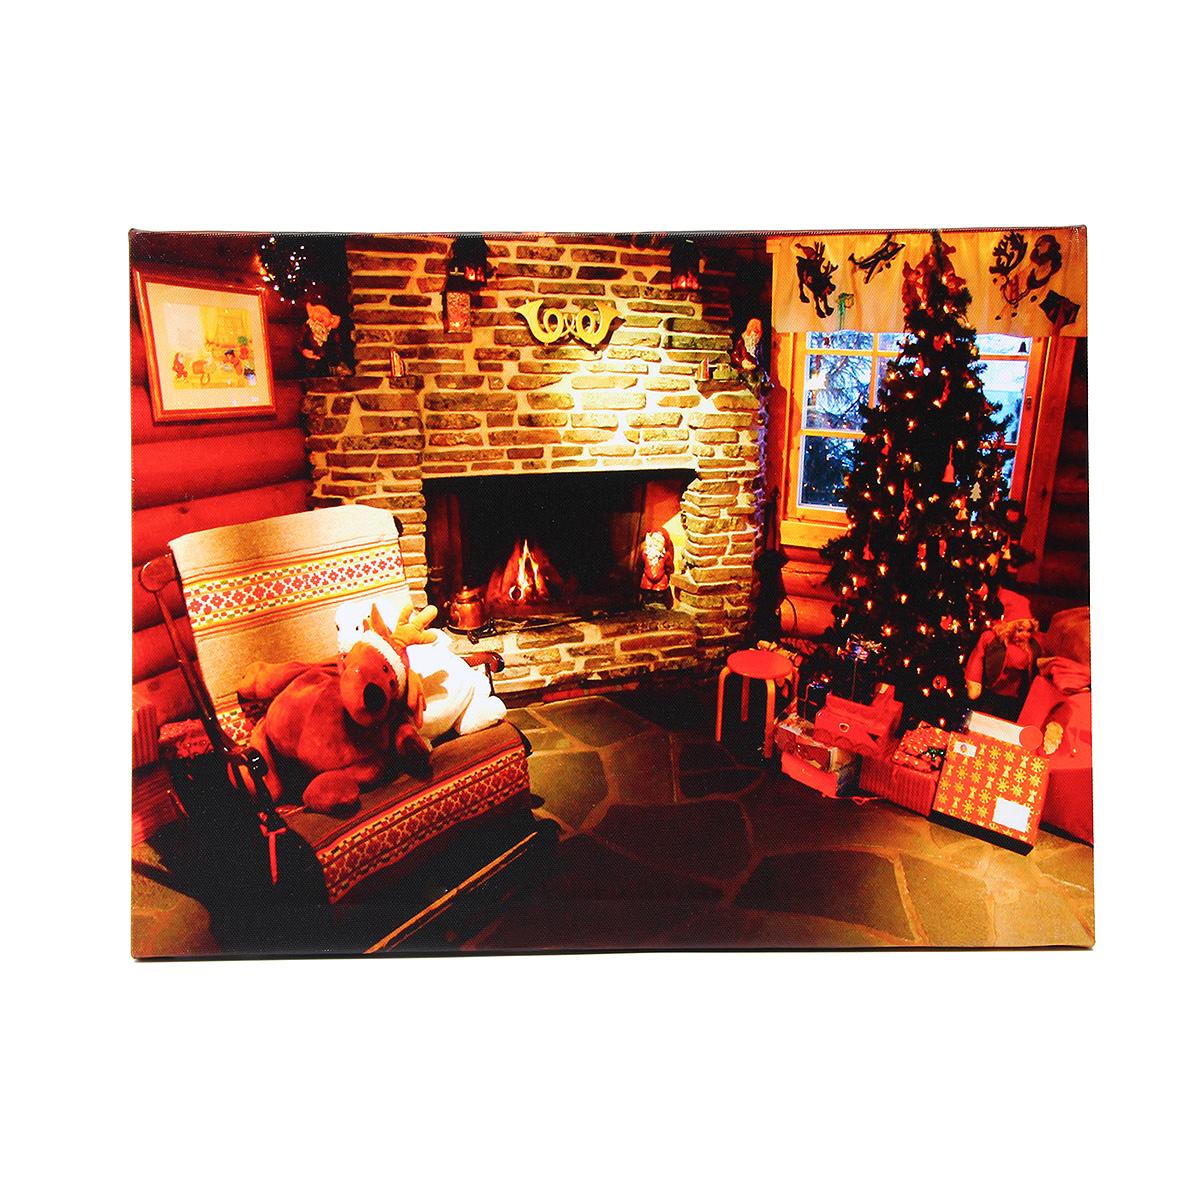 40 X 30cm Operated Led Home Christmas Decor Tree Xmas